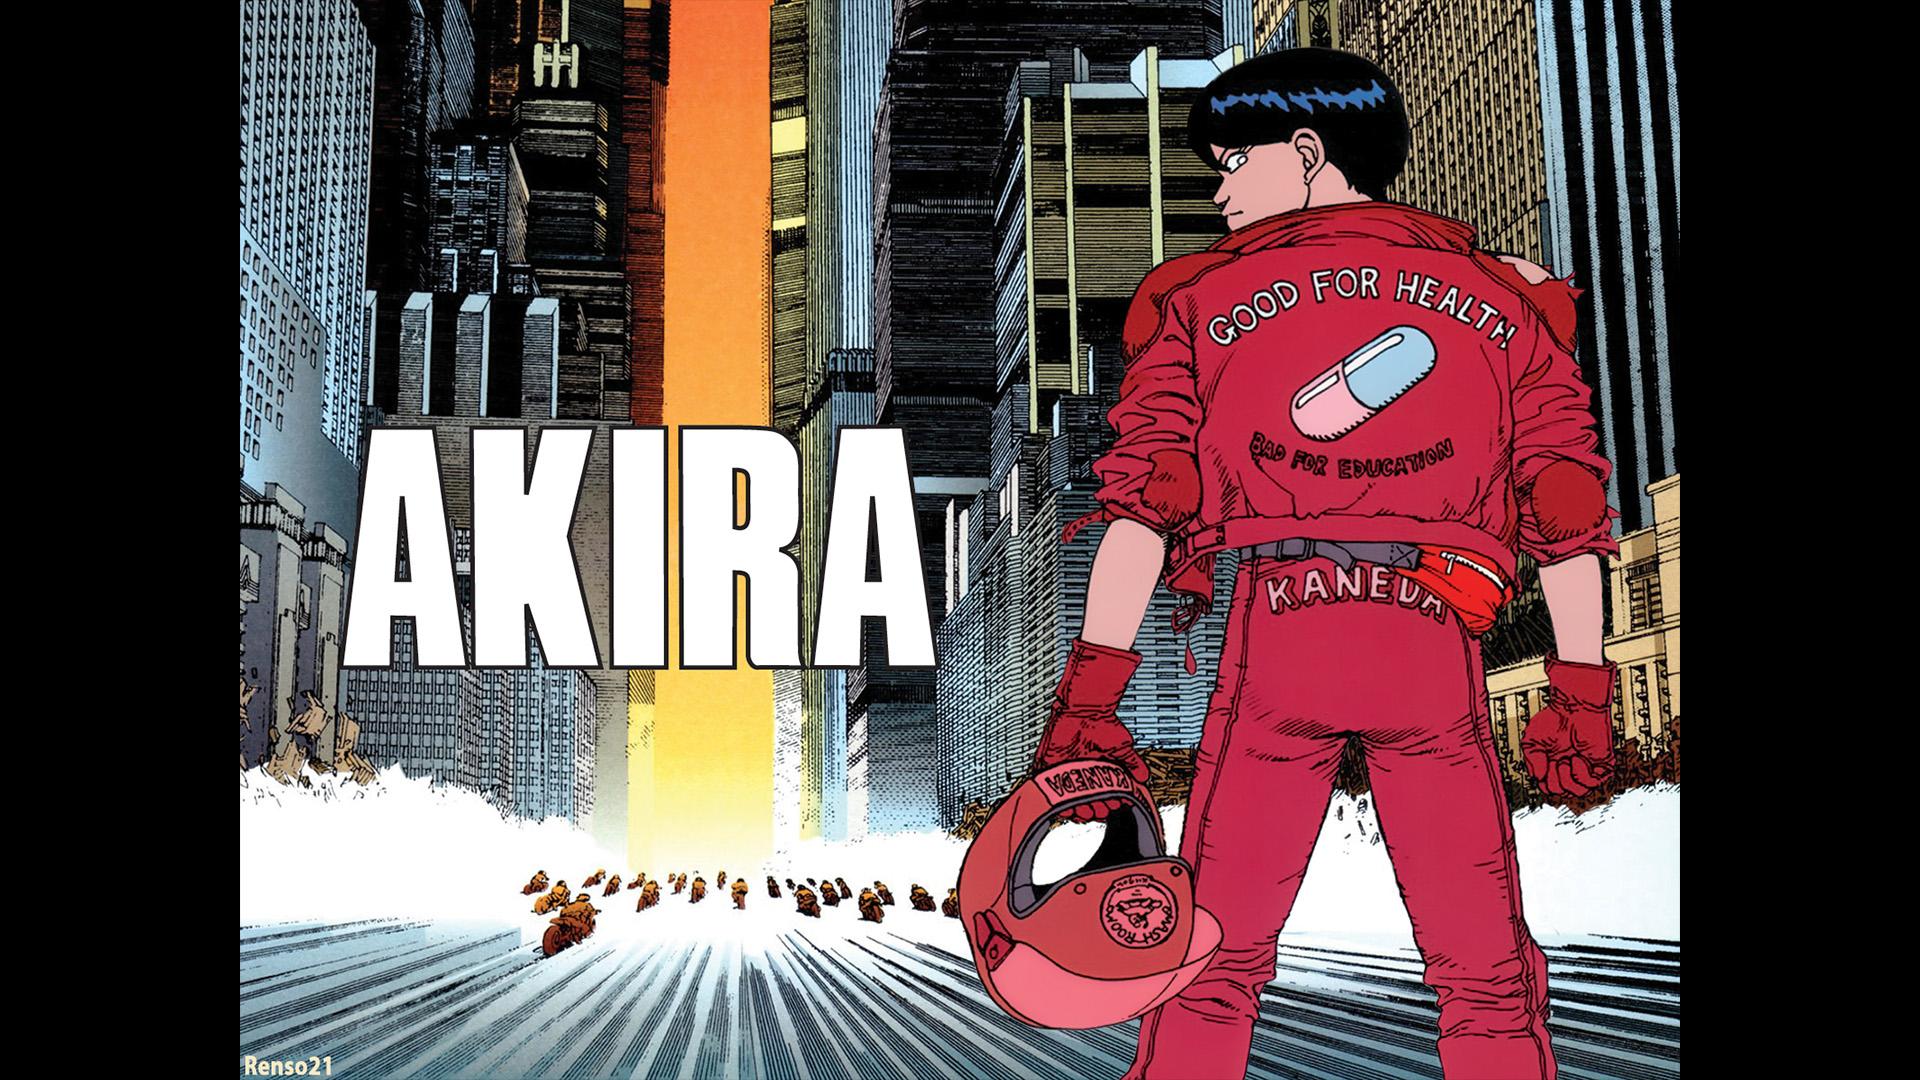 Akira 19x1080 Download Hd Wallpaper Wallpapertip